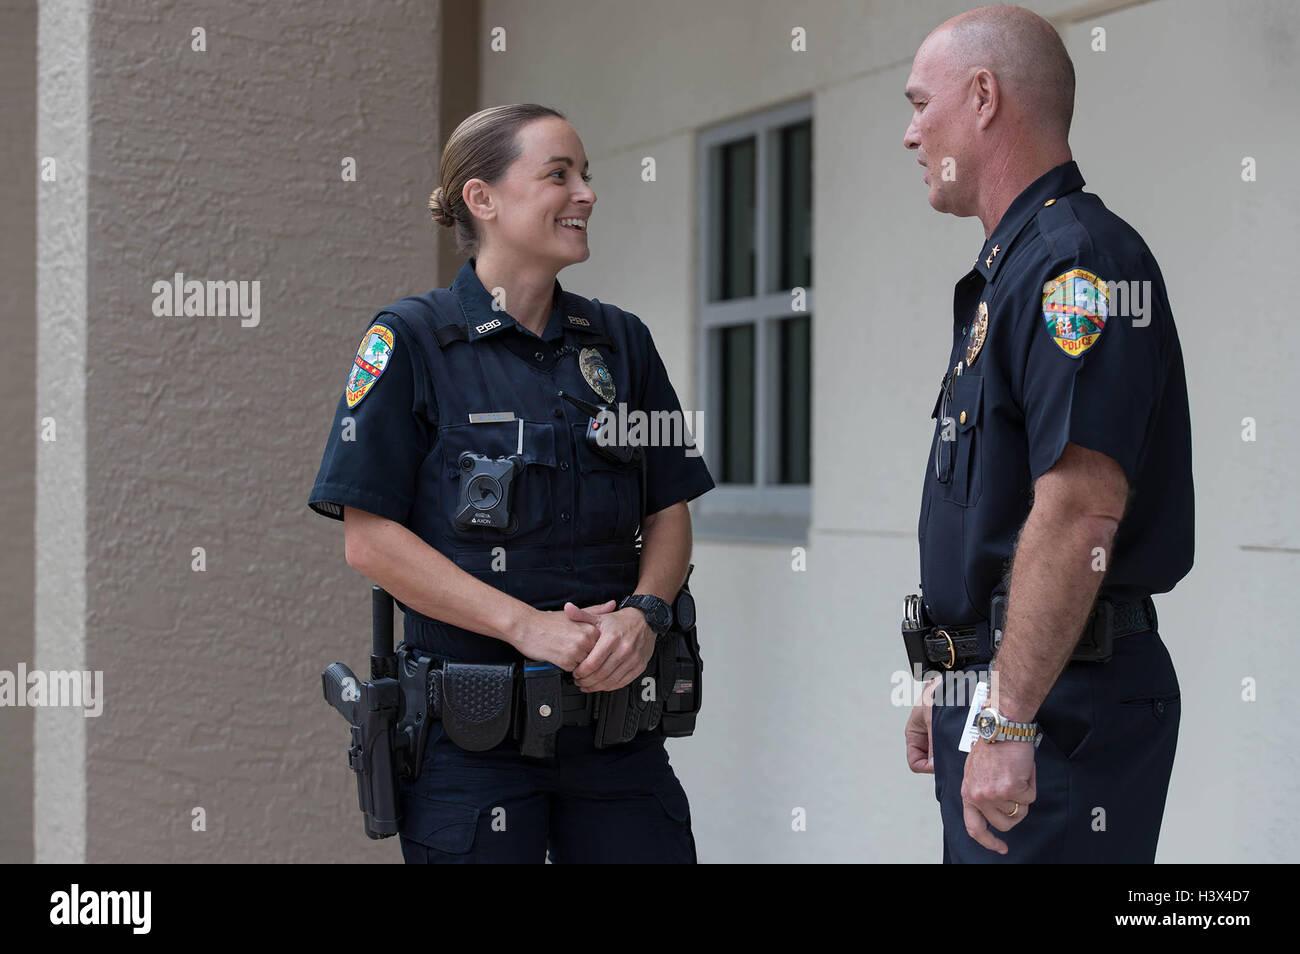 Tactical department stock photos tactical department - Palm beach gardens police department ...